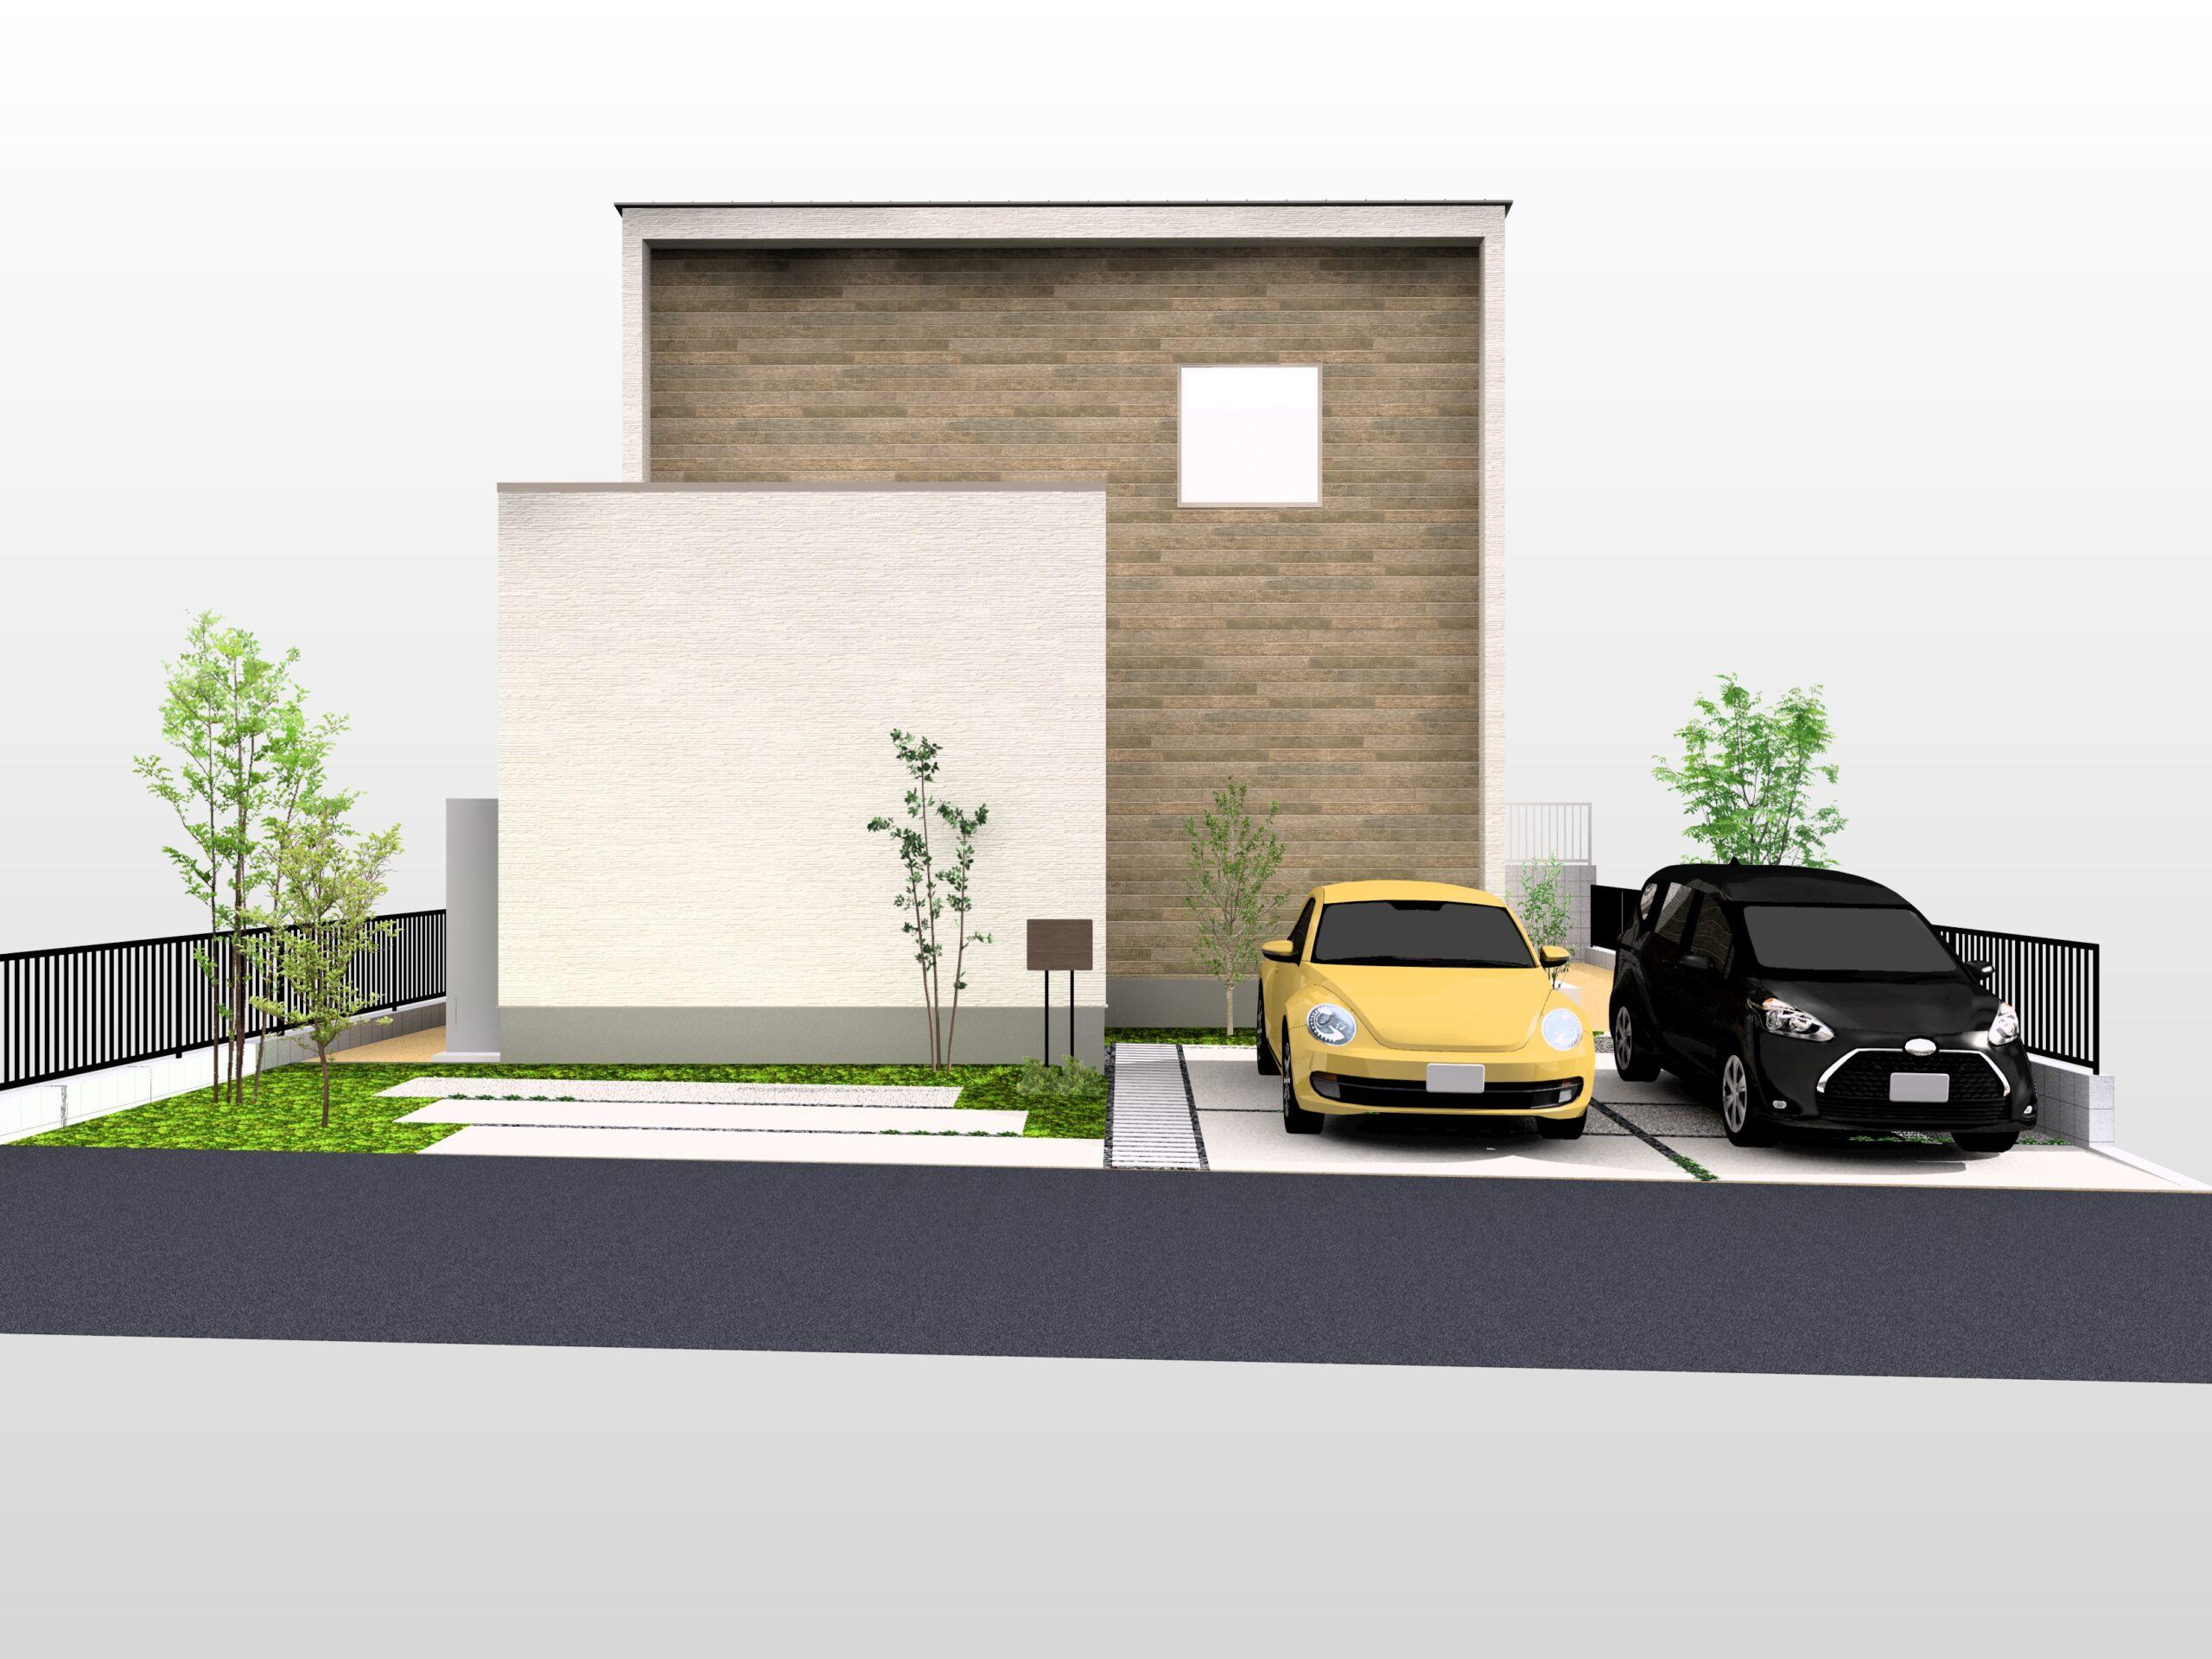 嬉野市新築建売住宅「OURS下野2号地」外観パース